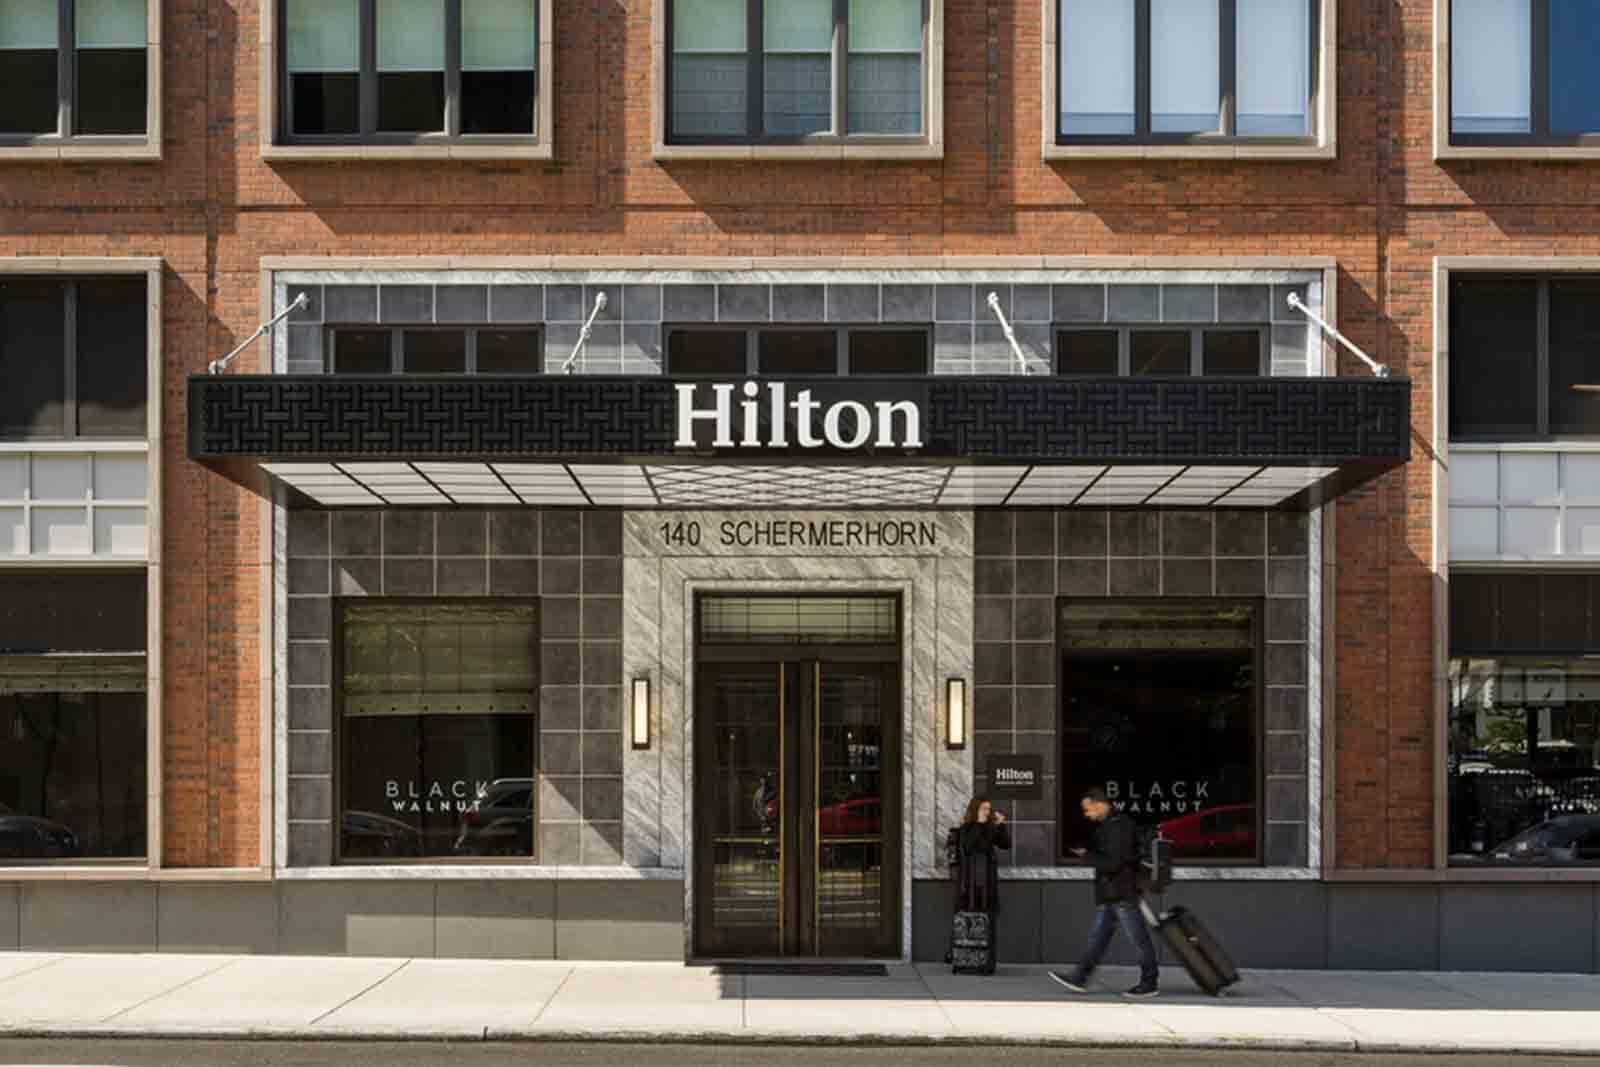 hilton-hoteles-nyc